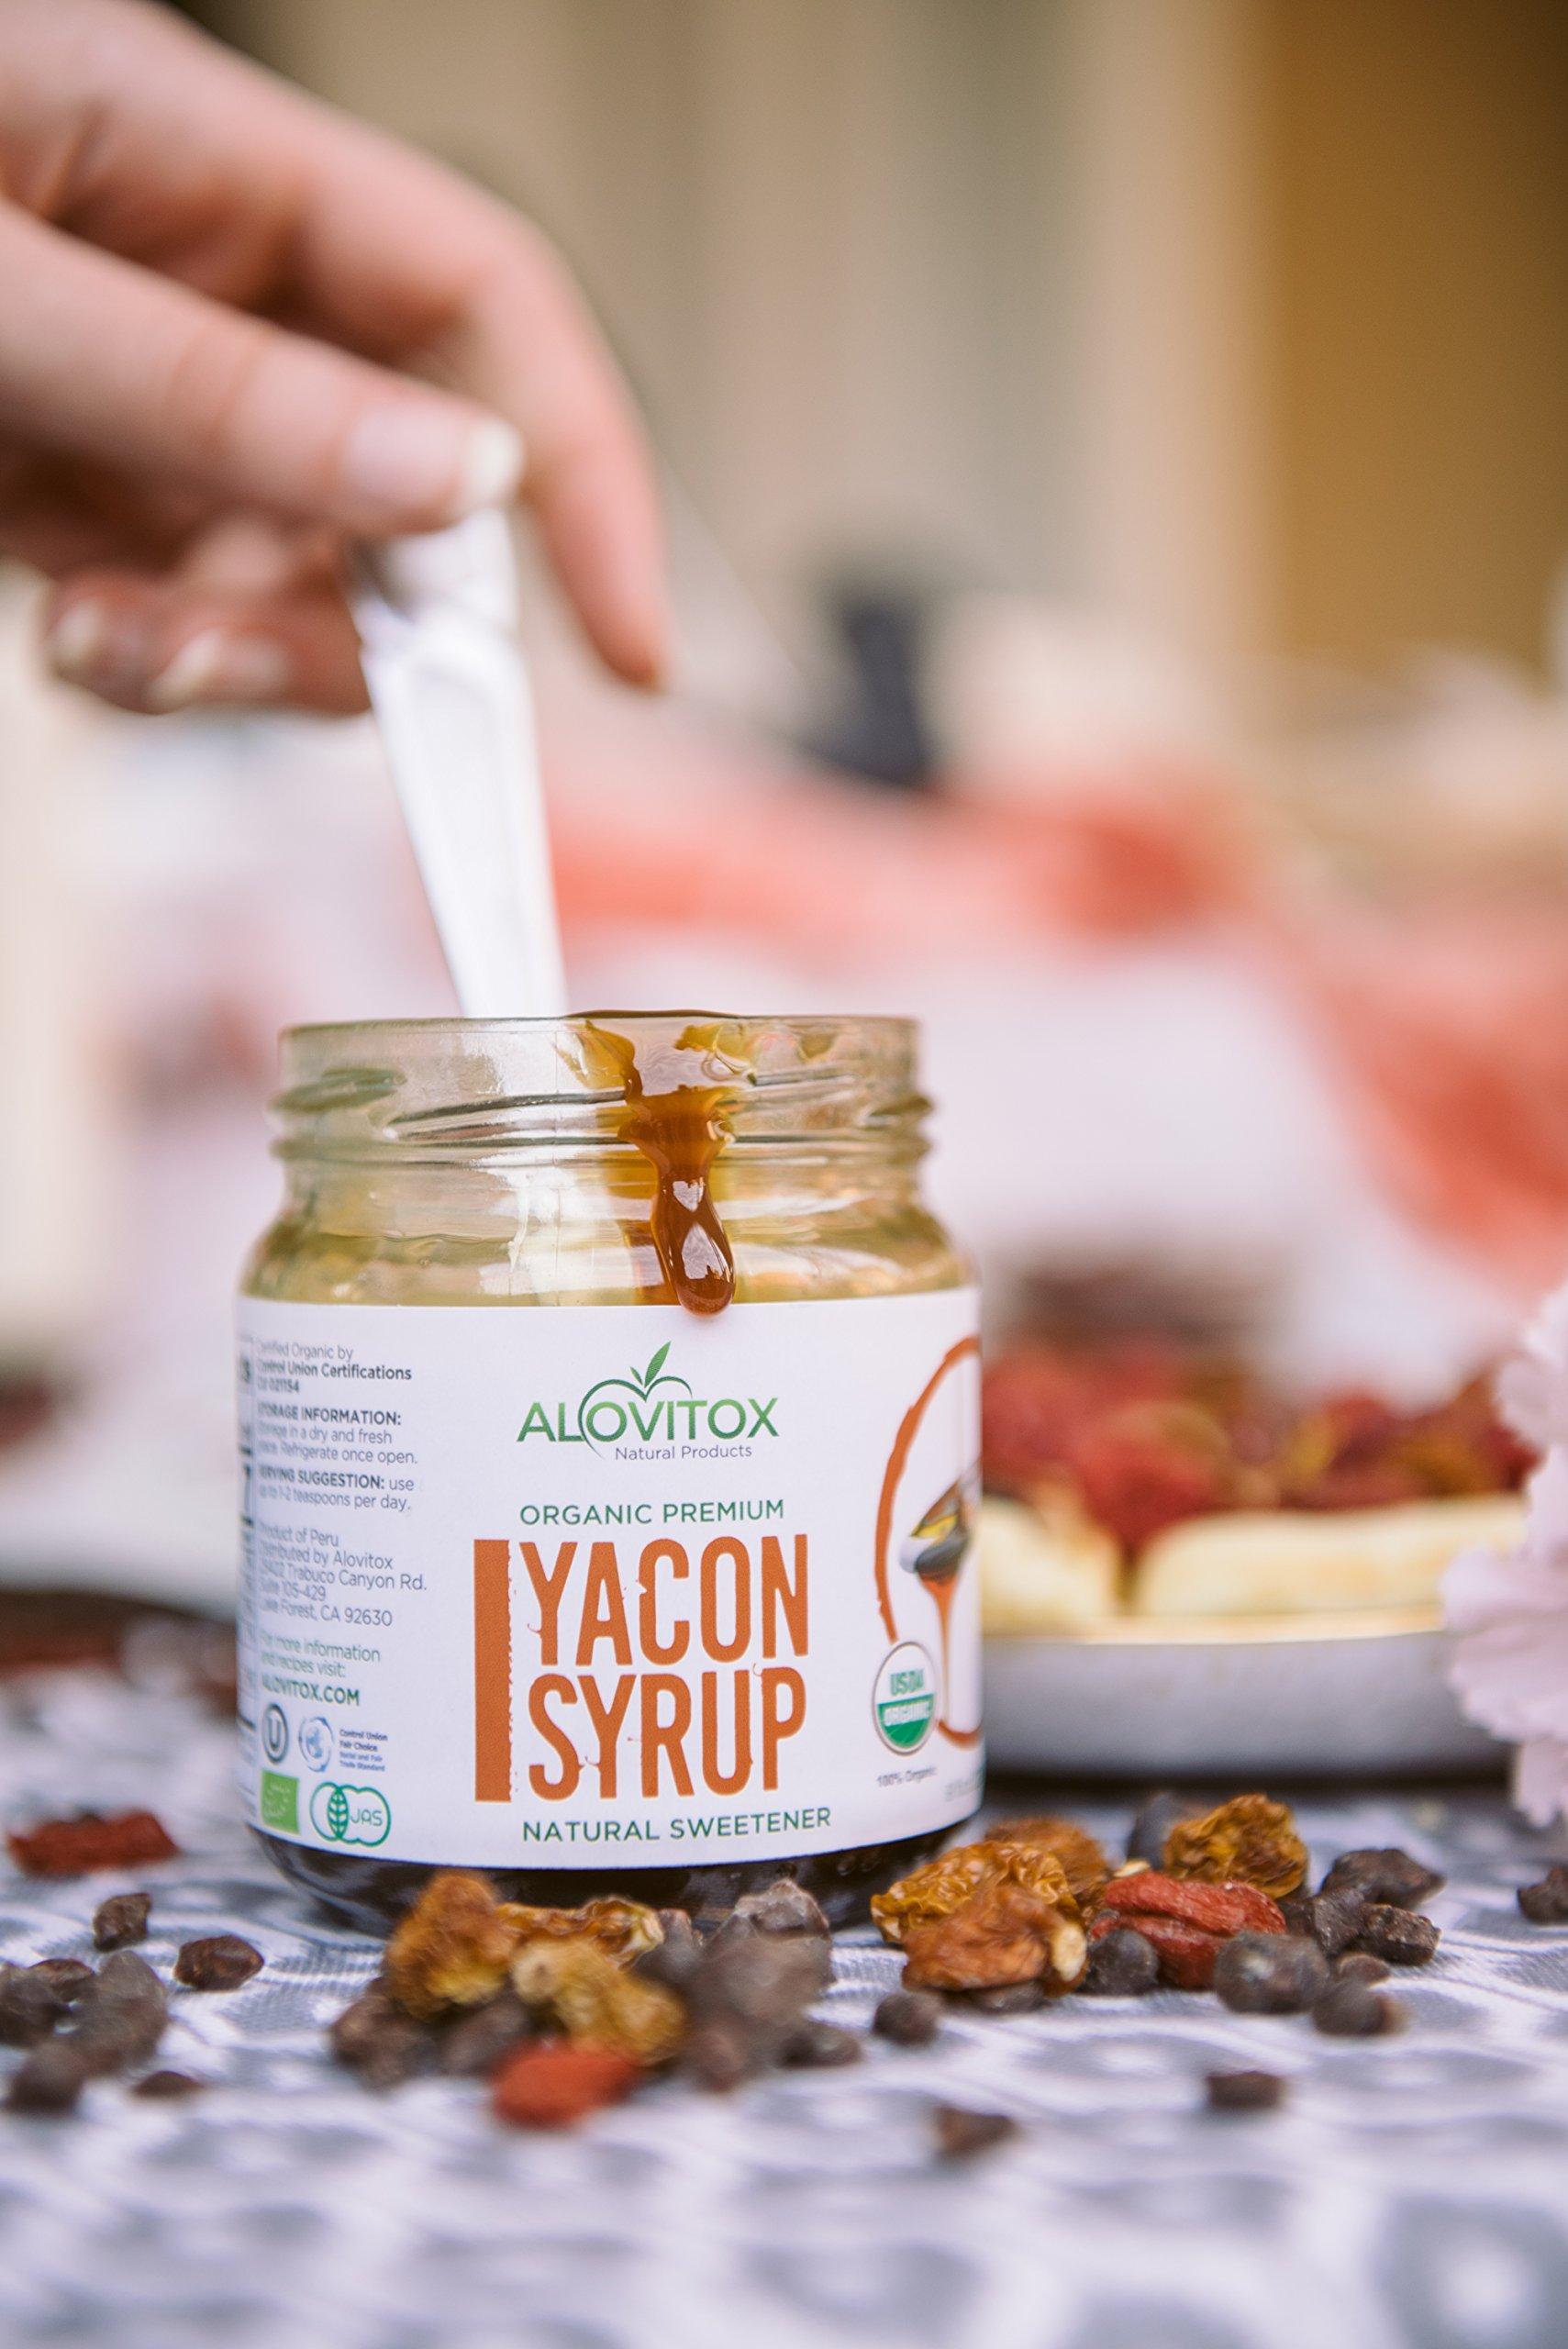 4 Pack Yacon Syrup - USDA Certified Organic Natural Sweetener - All-Natural Sugar Substitute - 8 Oz. SafeGlass Jar - Keto Vegan & Gluten Free by Alovitox (Image #9)